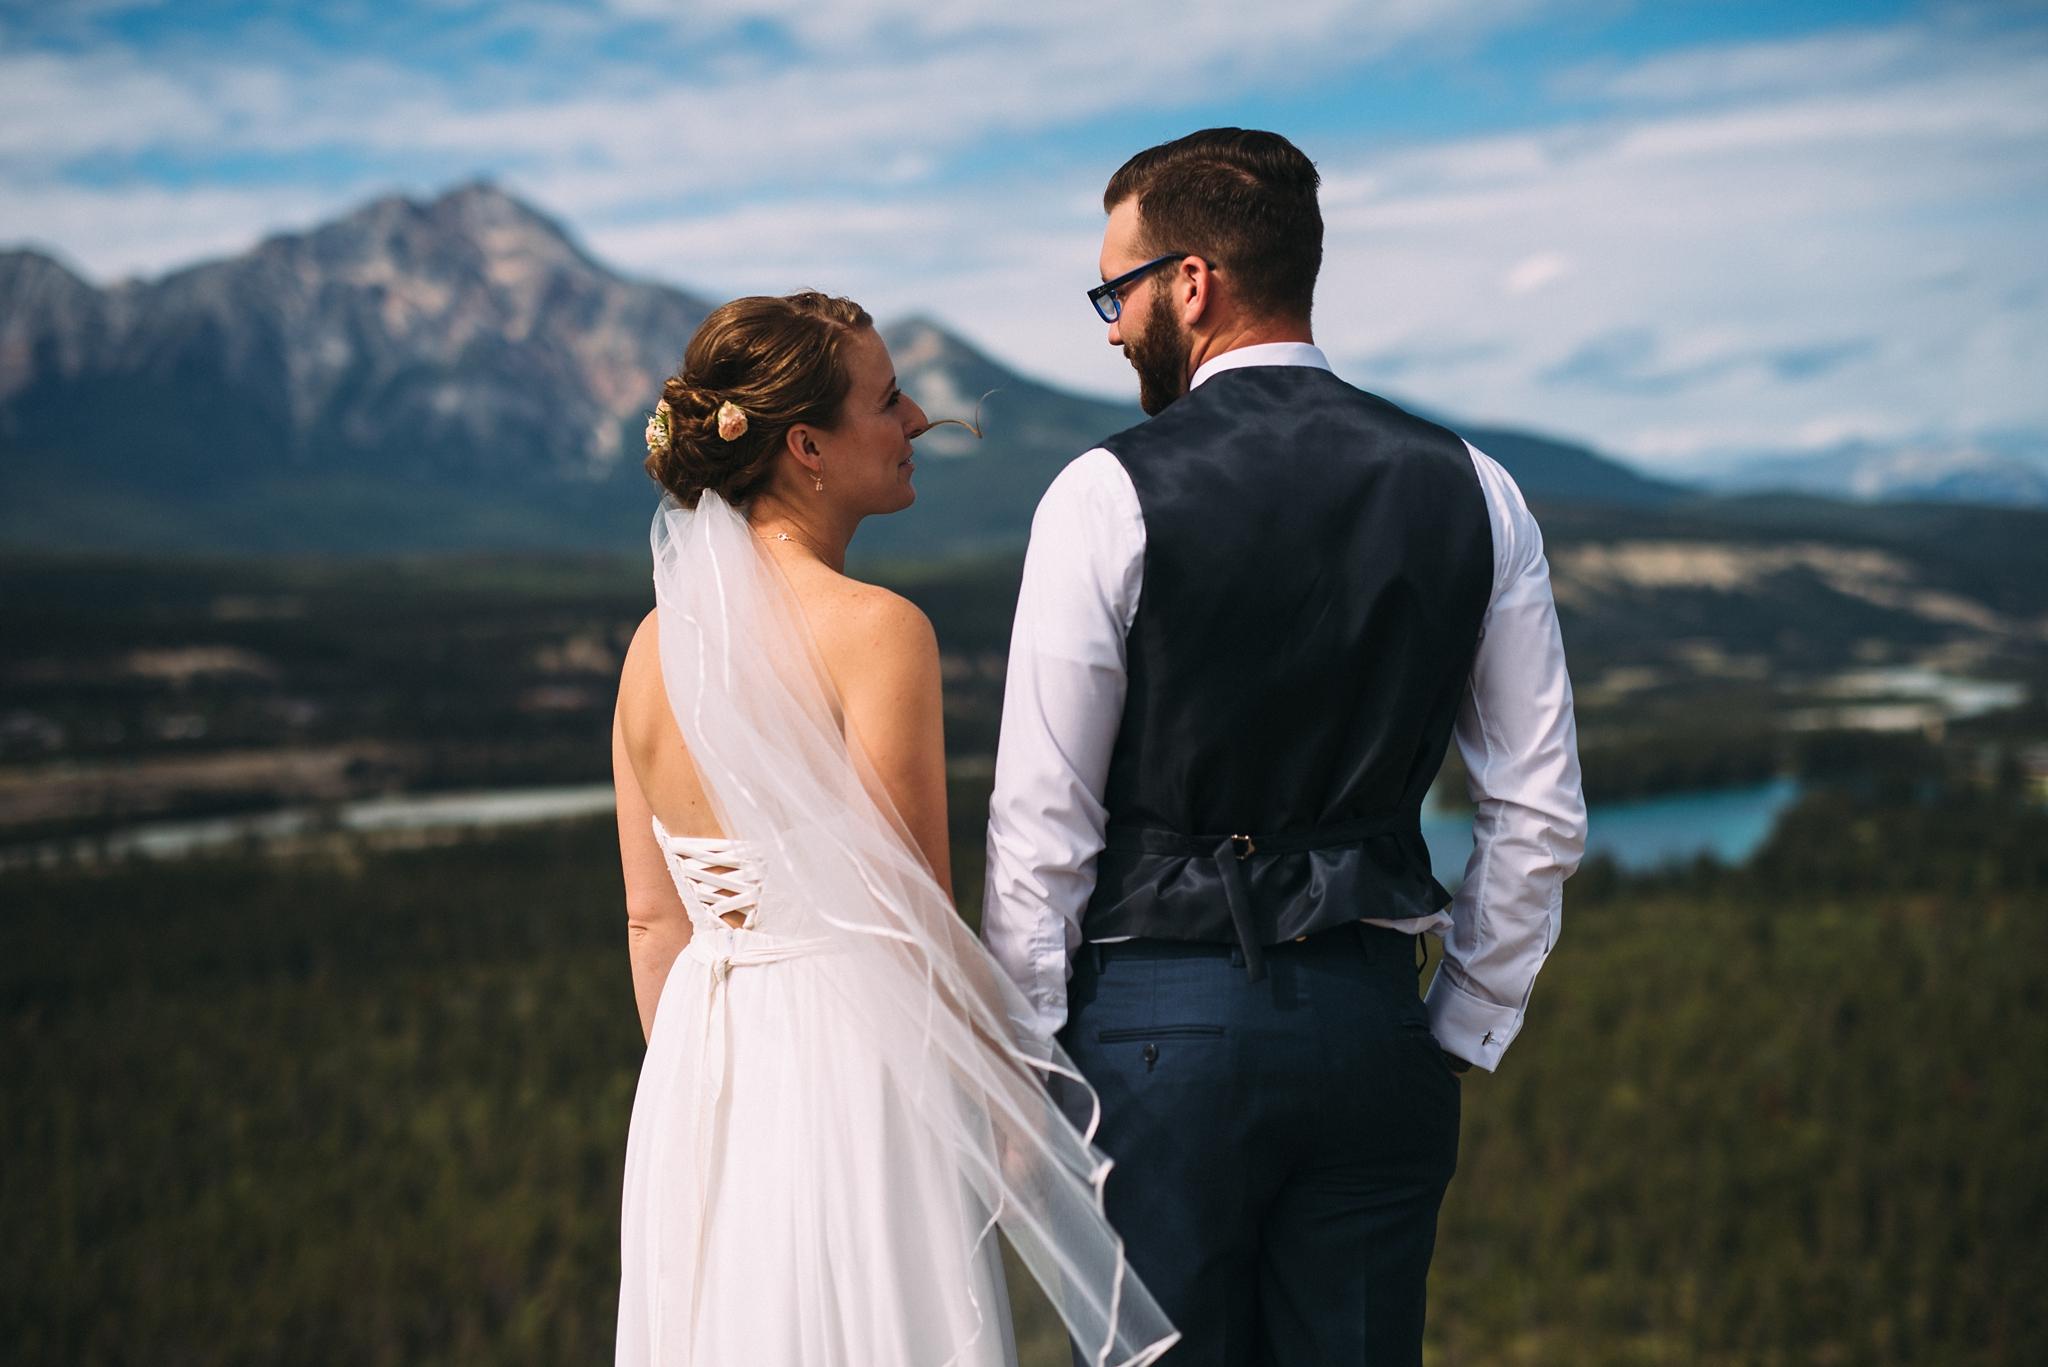 kaihla_tonai_intimate_wedding_elopement_photographer_2481